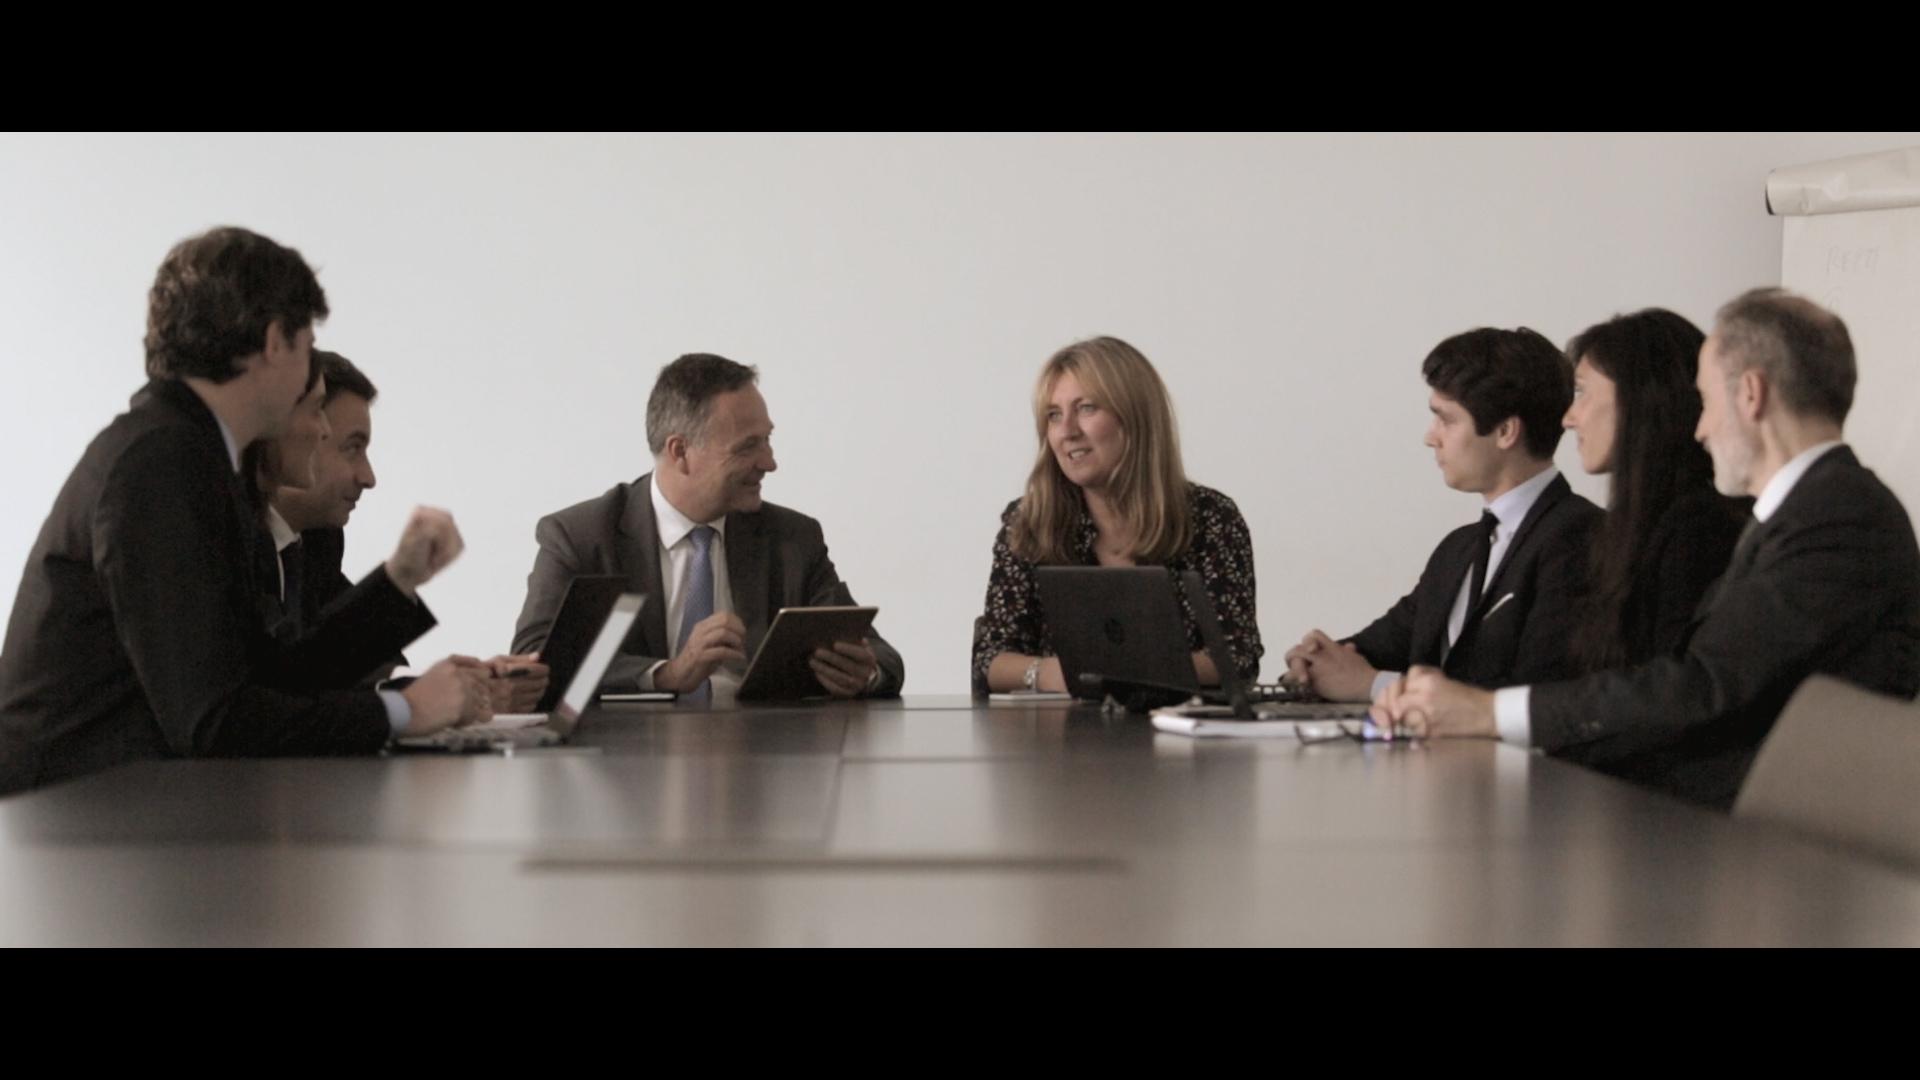 interview-video-realisation-production-banque-bnp-paribas-leo-meslet-xaleo-studio